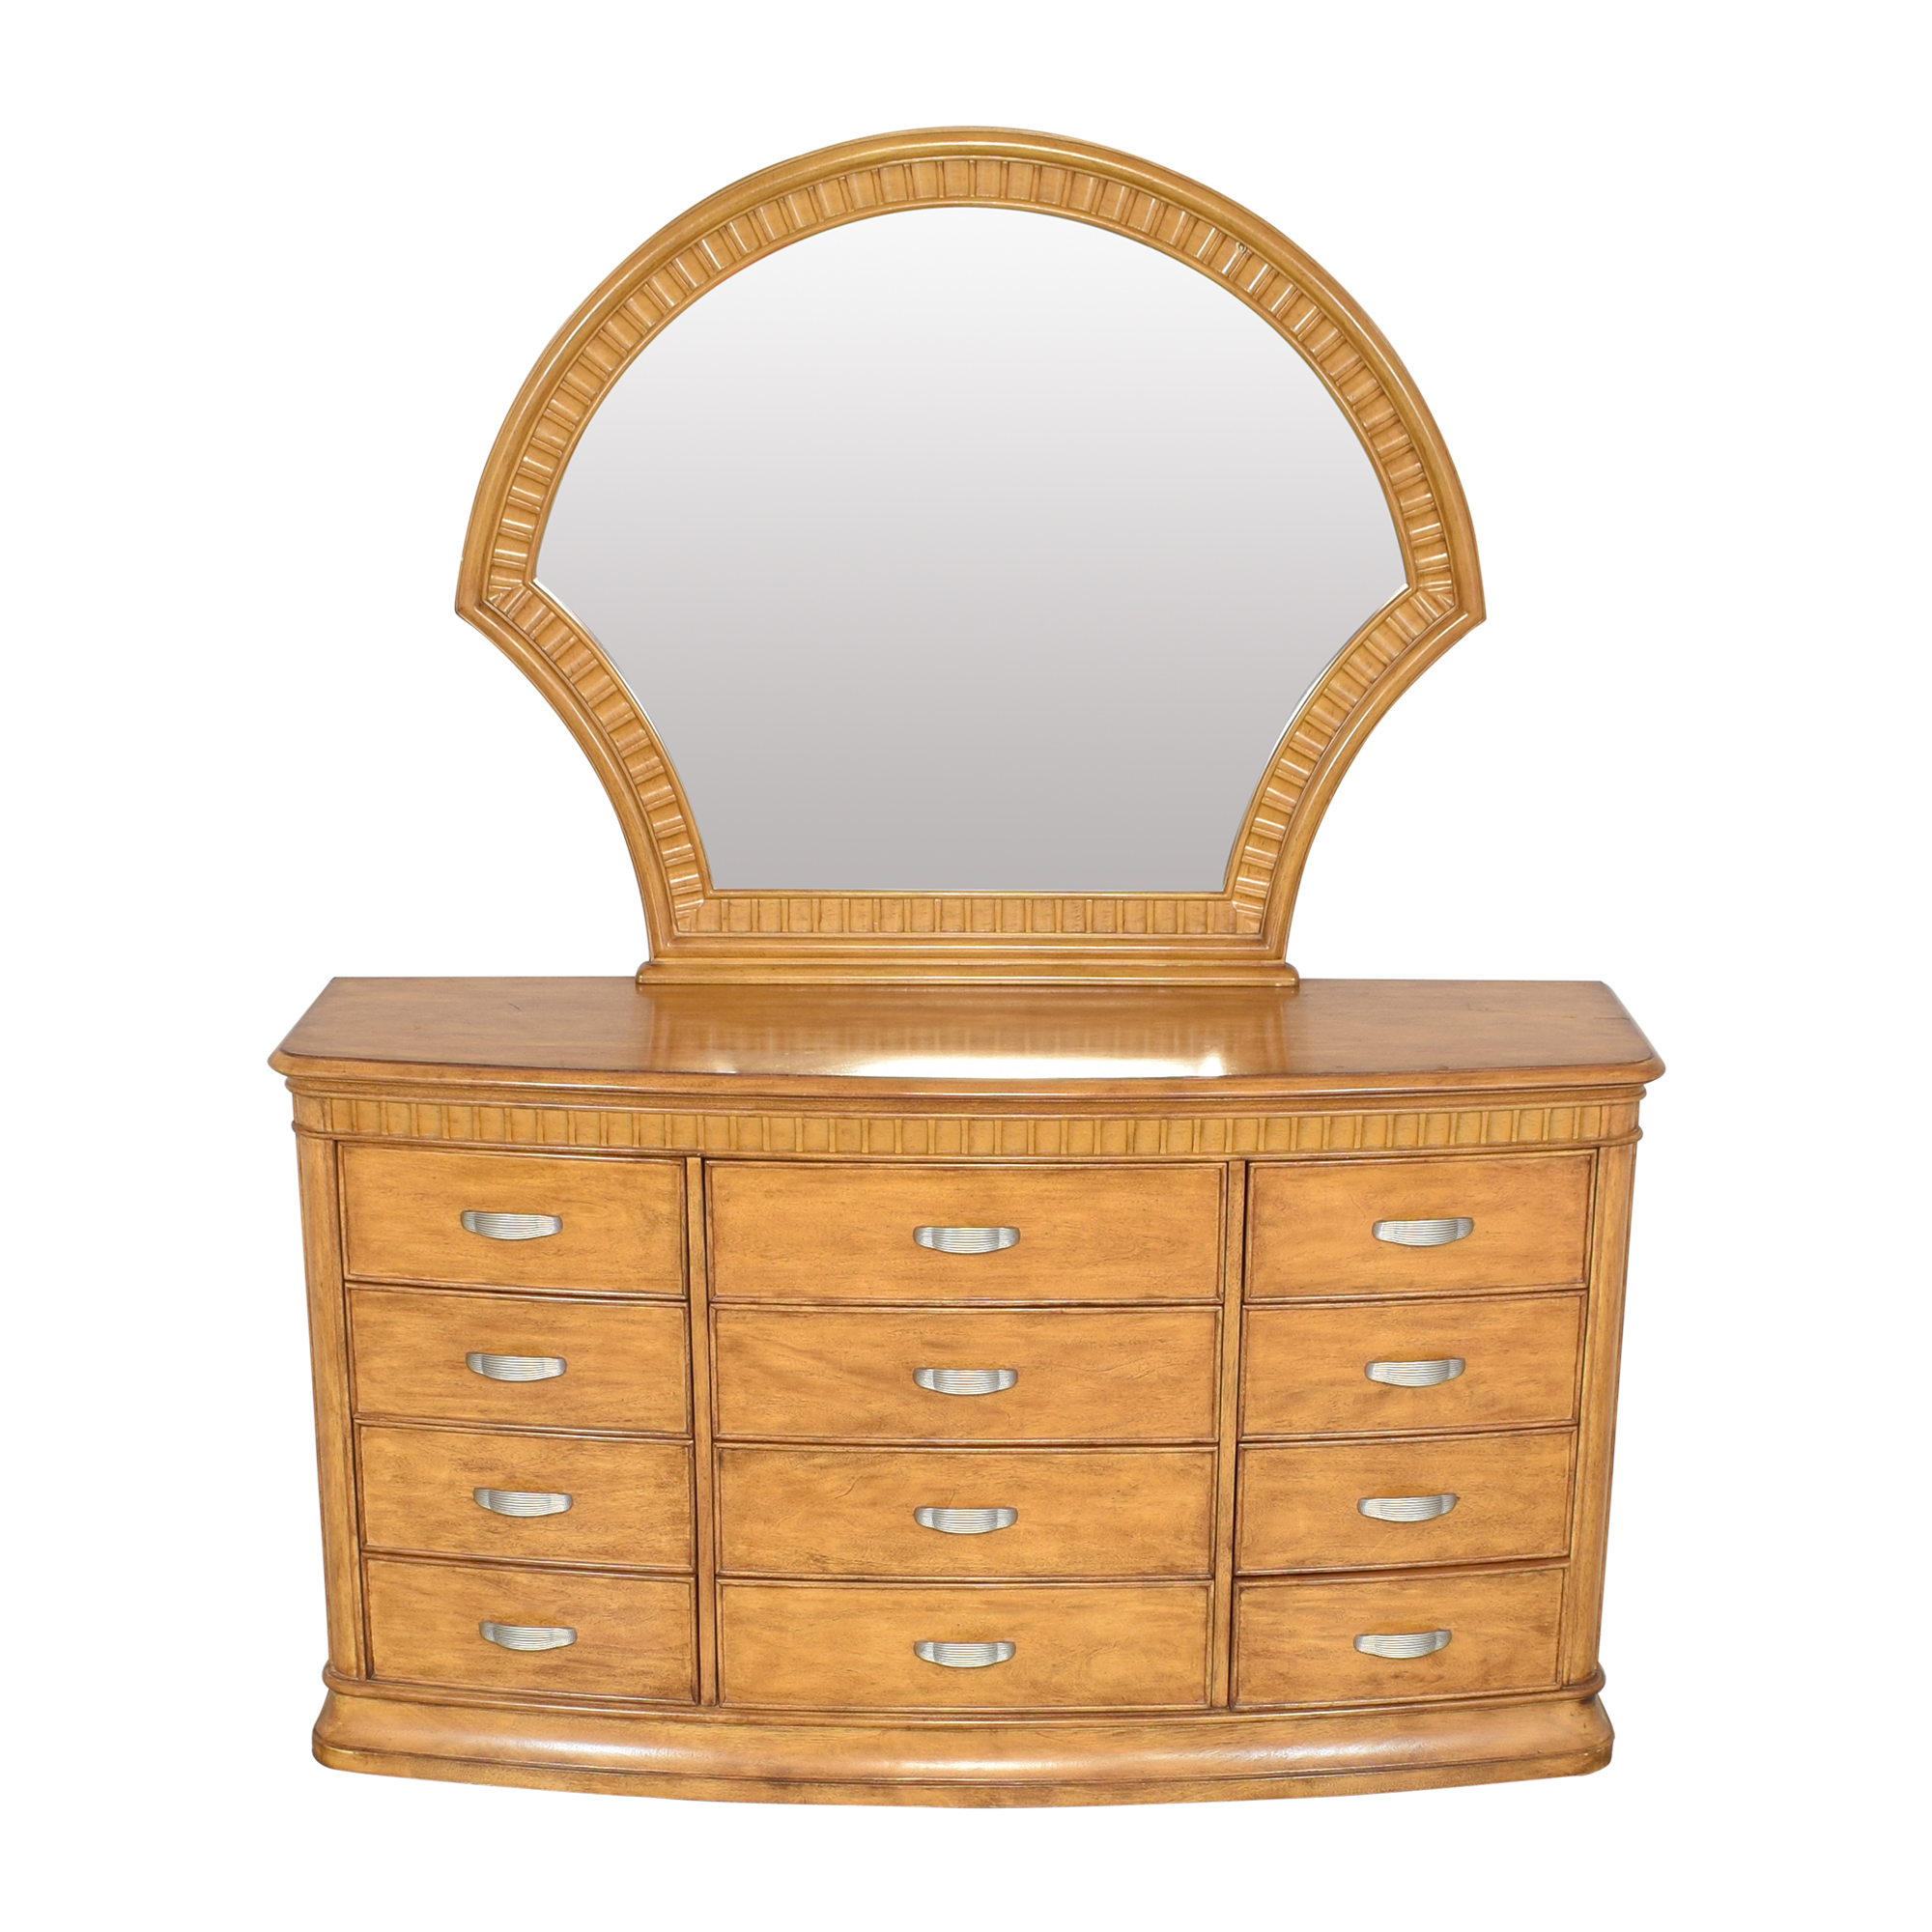 Triple Dresser Vanity with Mirror nj